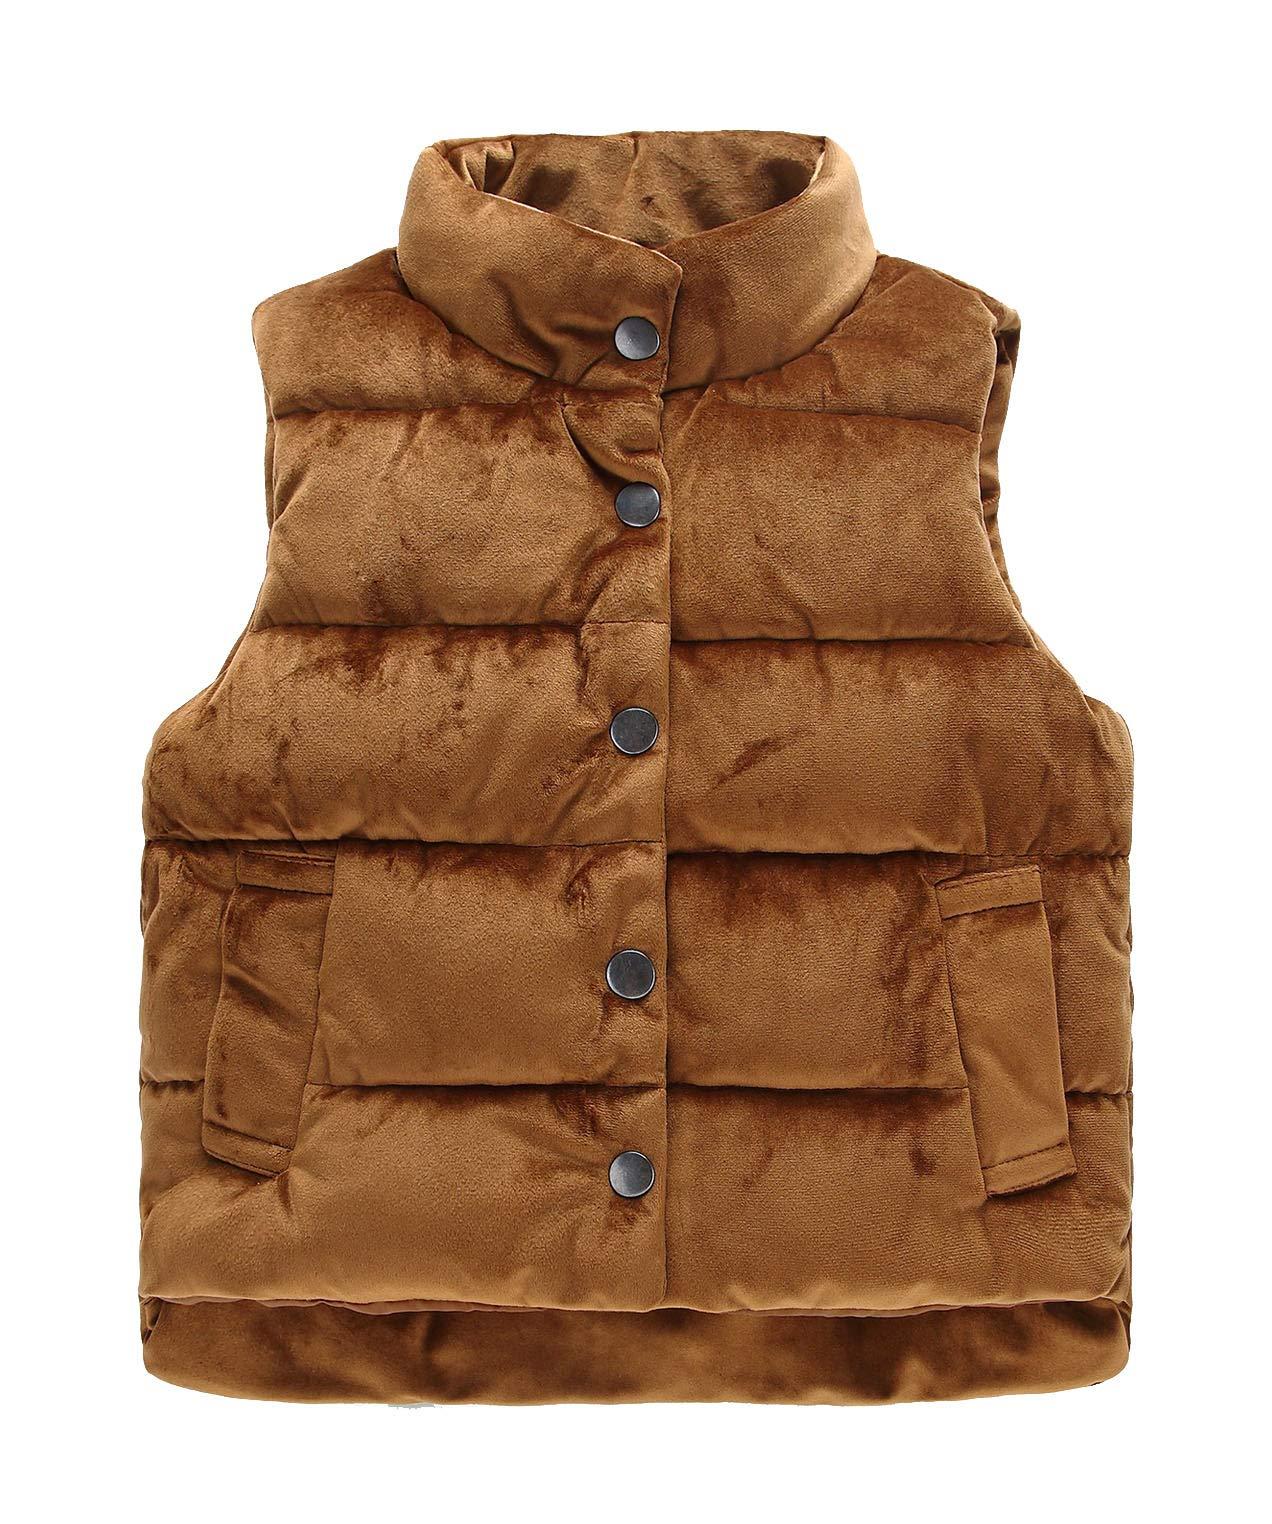 Roffatide Boys Girls Warm Stuffed Vest Lightweight Waistcoat Sleeveless Gilet Brown 140cm